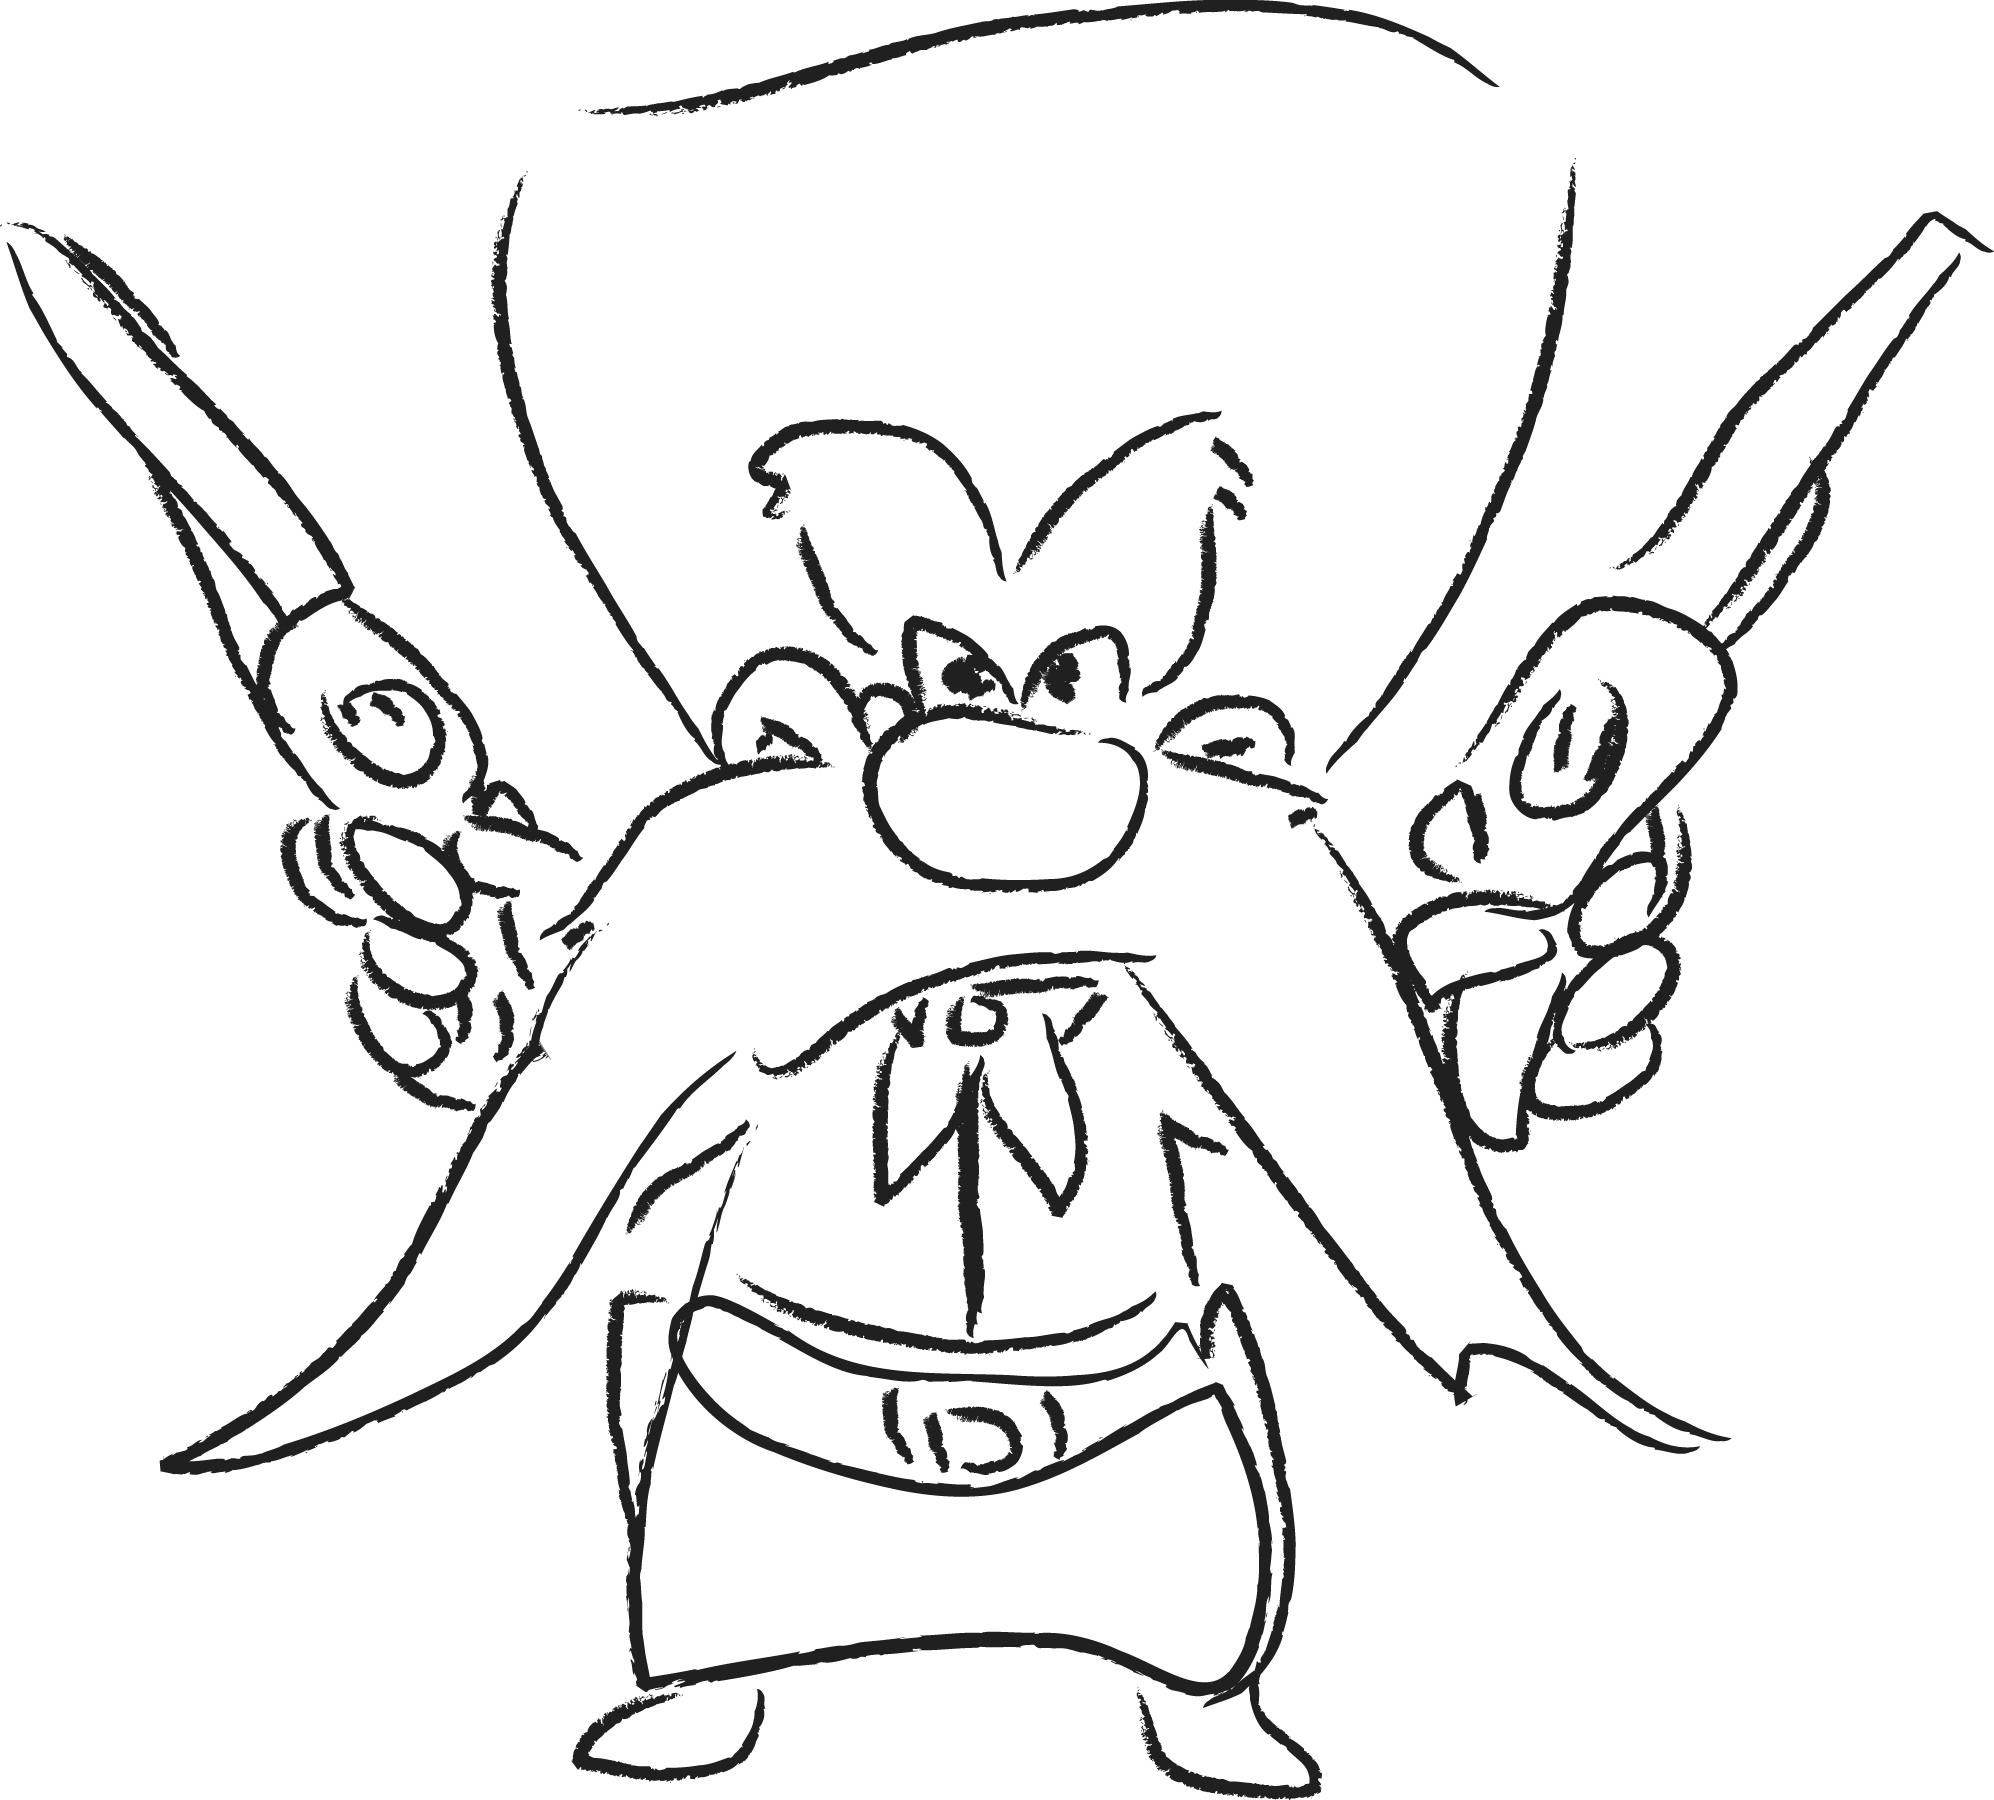 1994x1800 Pencil Drawings Of Cartoon Characters